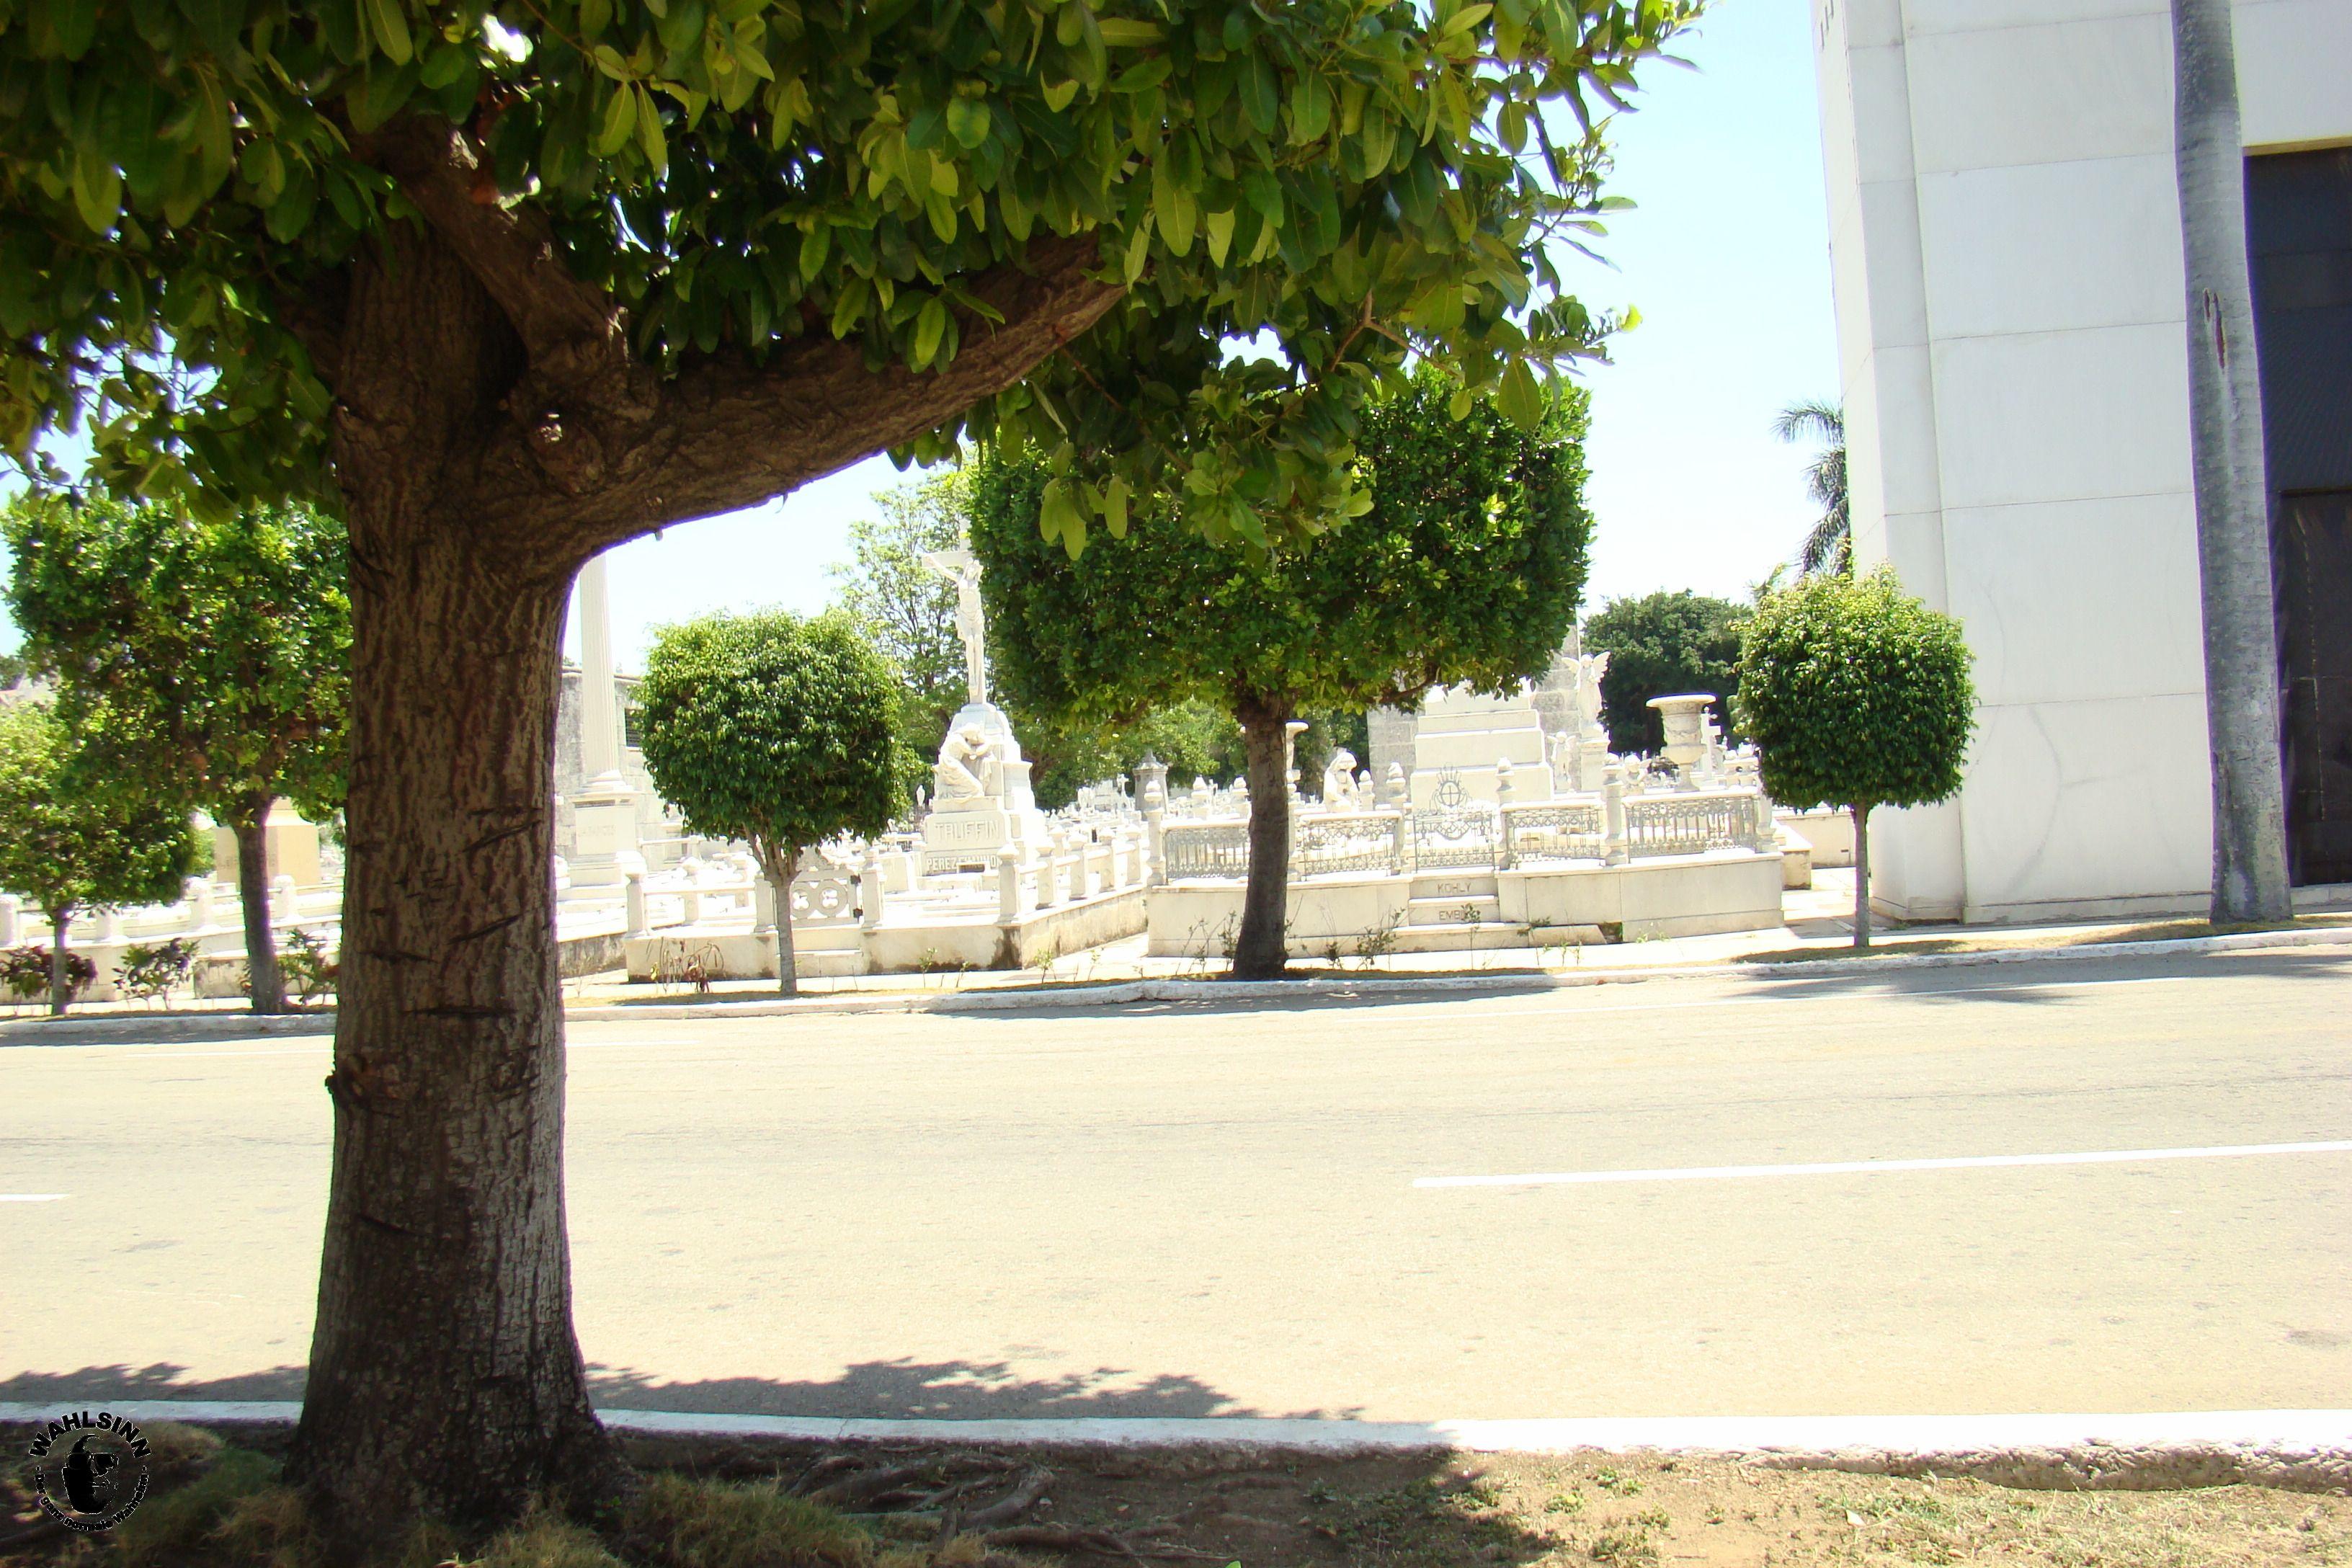 Friedhof oder Park? // Havanna (Kuba)